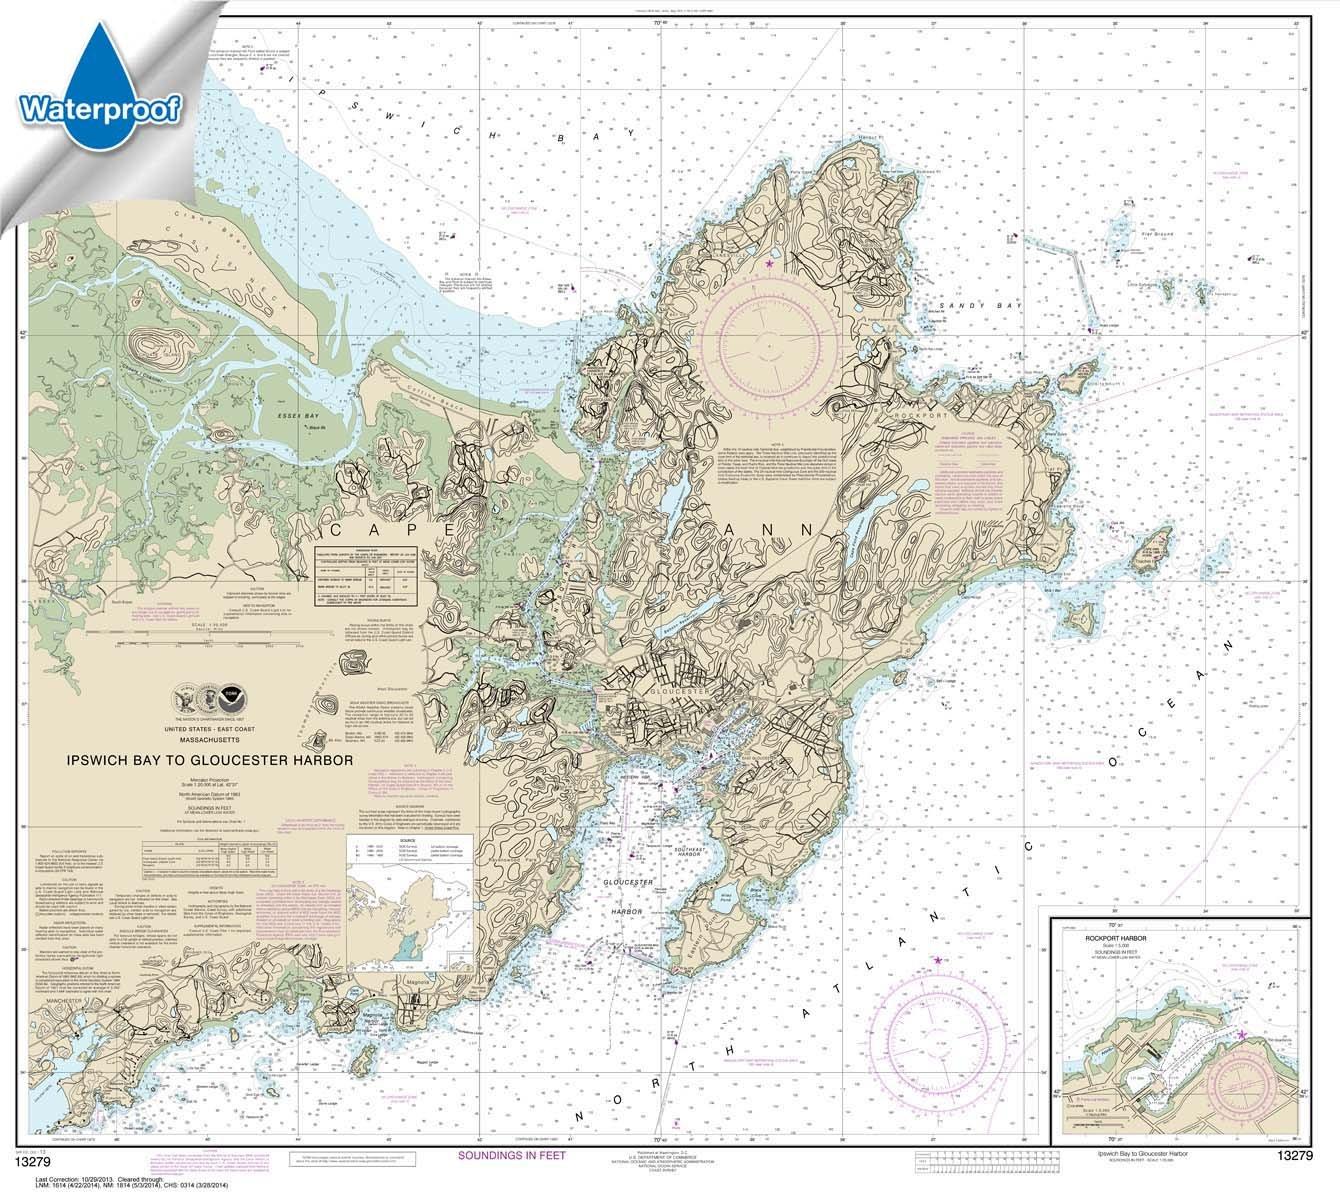 Ipswich Bay to Gloucester Harbor; Rockport Harbor 35.5 x 39.8 Paradise Cay Publications NOAA Chart 13279 WATERPROOF